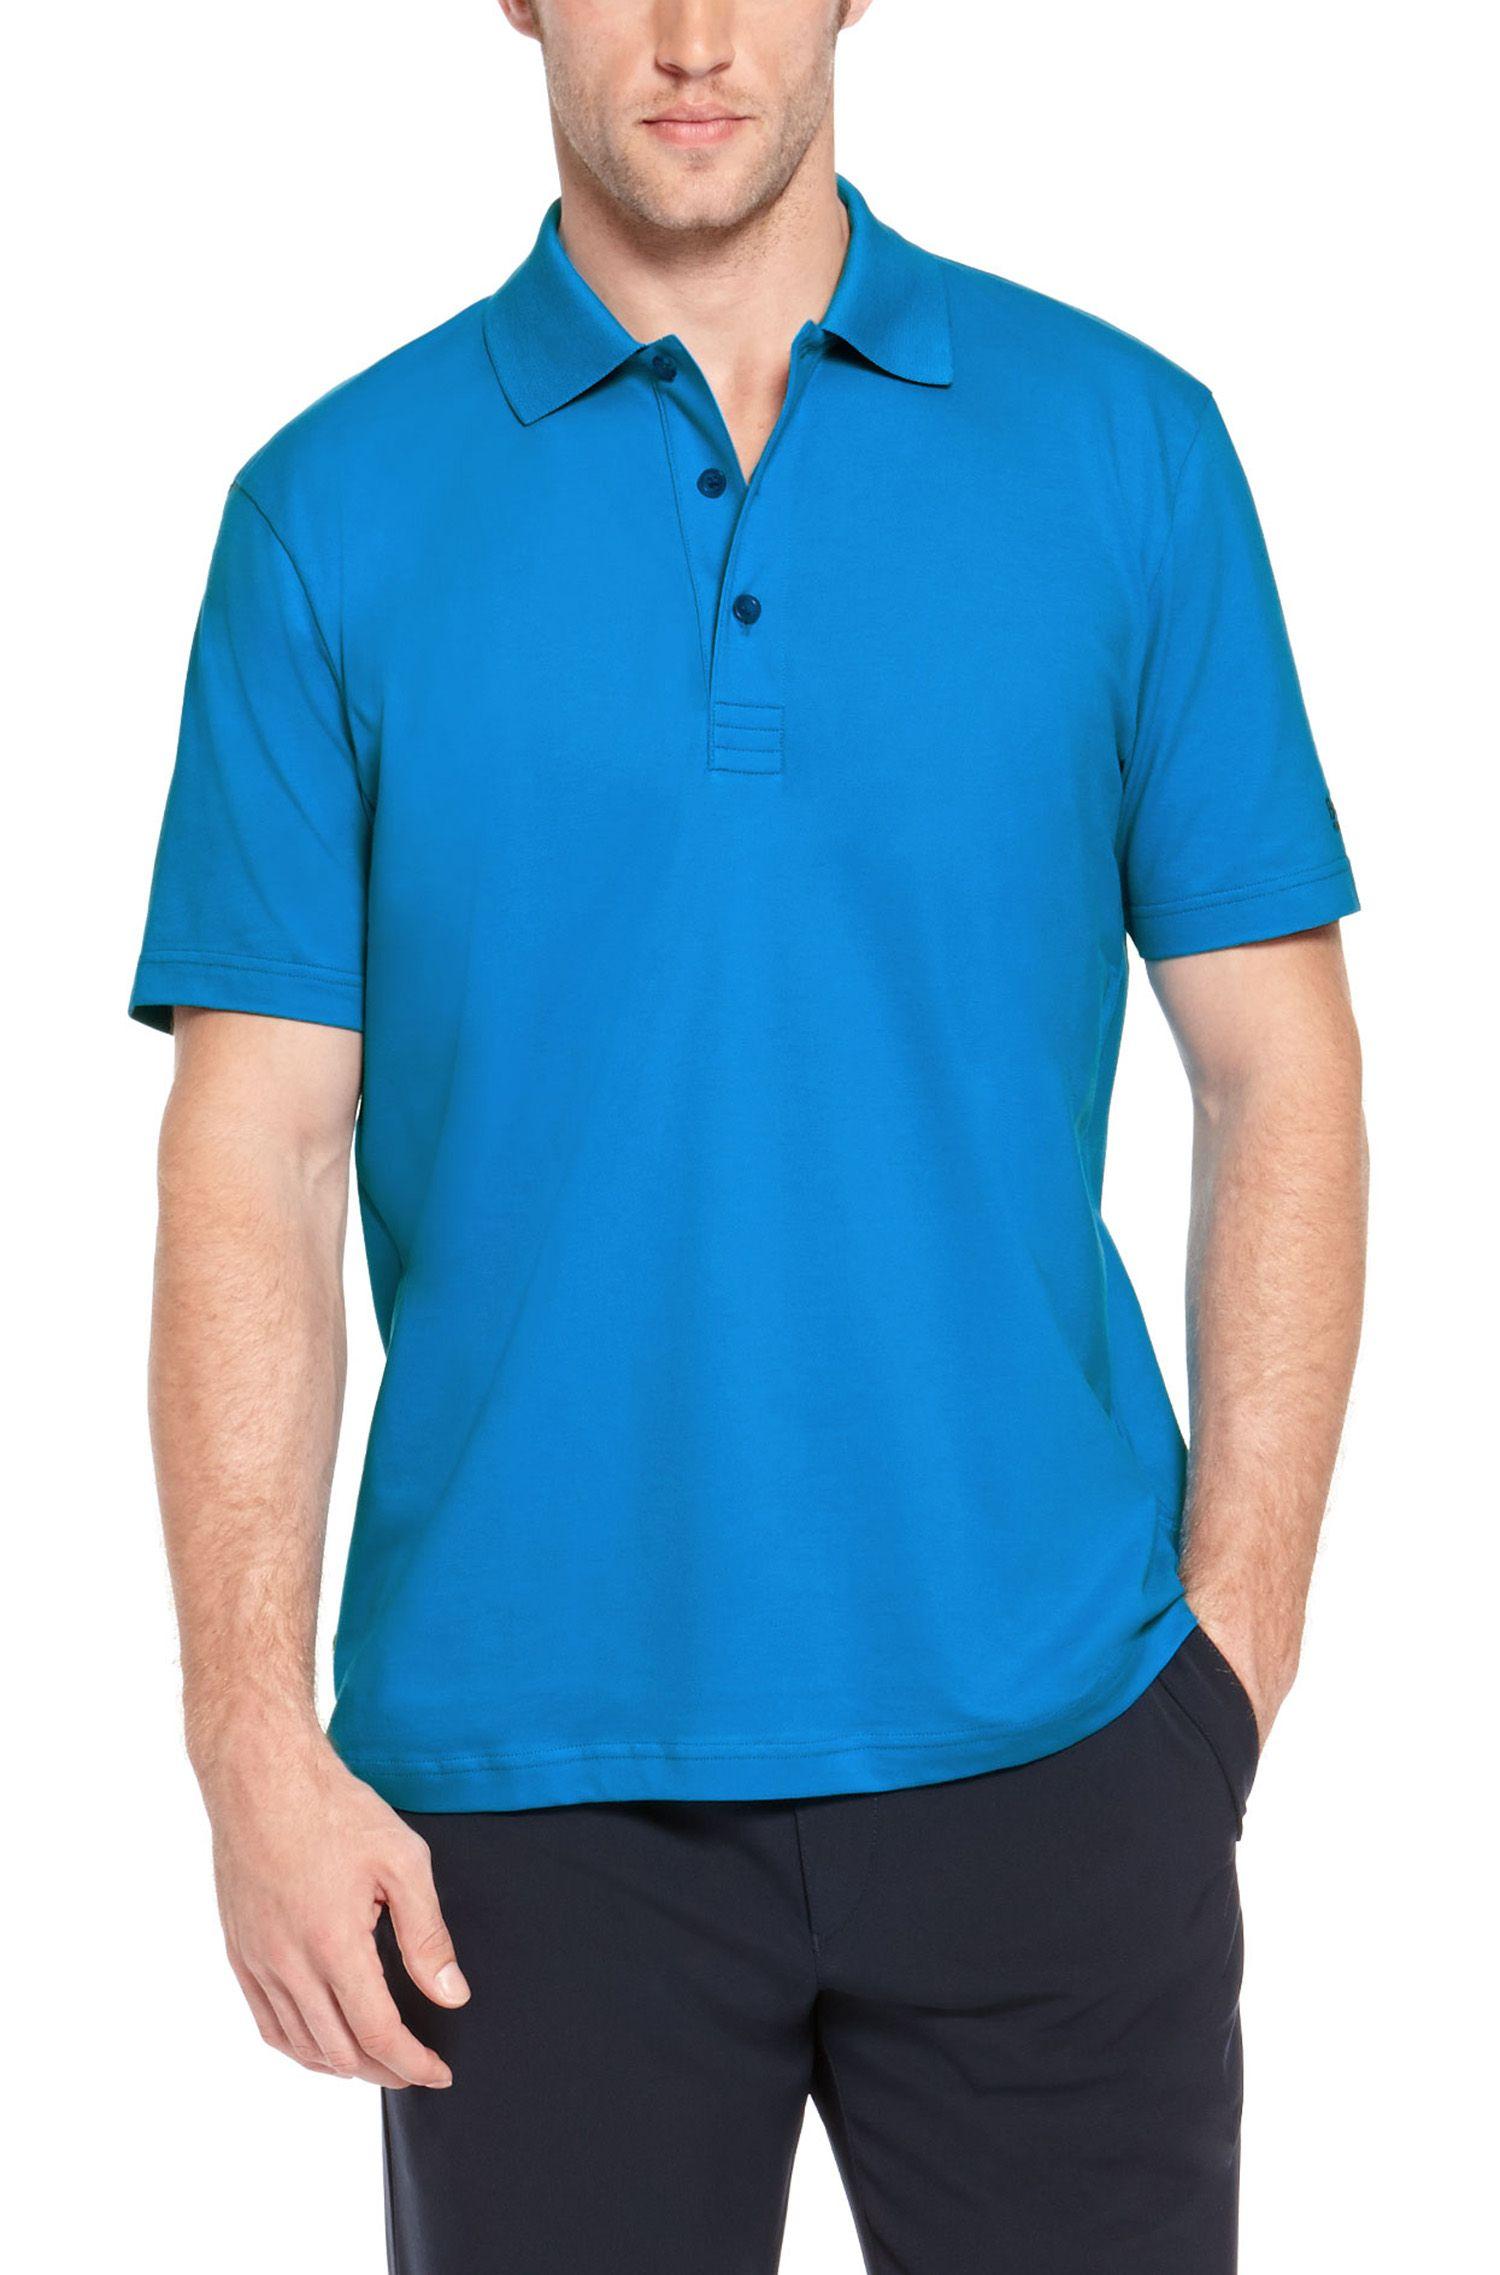 'Patrick US' | Regular Fit, Cotton Stretch Polo Shirt